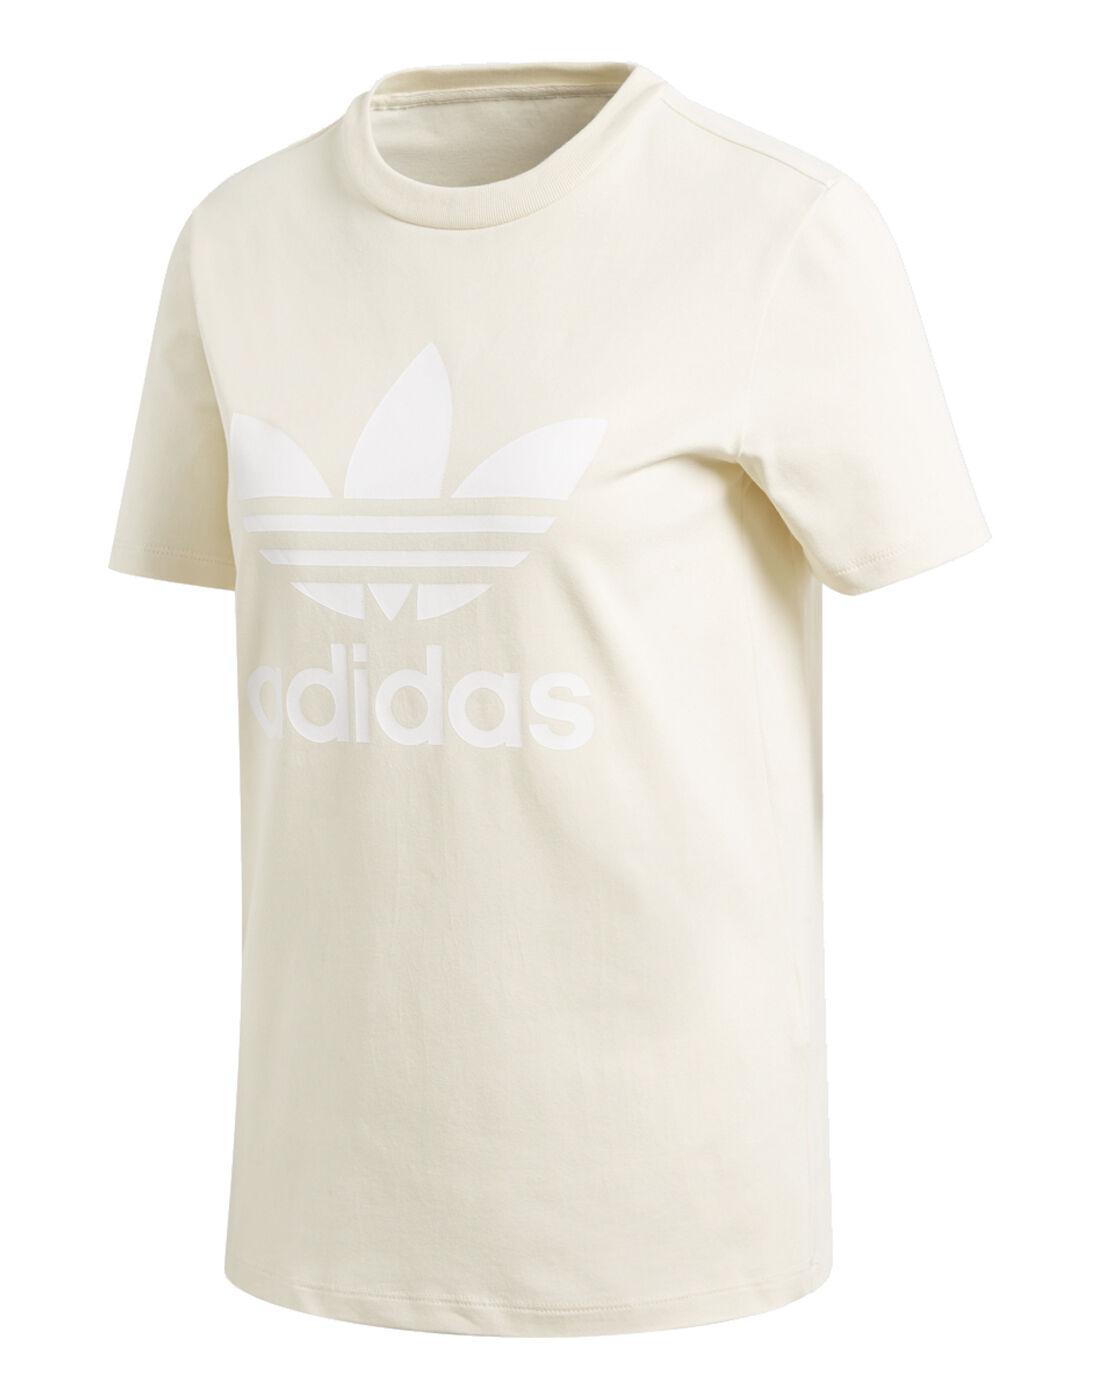 Http Mine Offerl4xp5h2mpage Https Iebayimg Tendencies Tshirt Neon Cross Hitam L 64505970xlarge